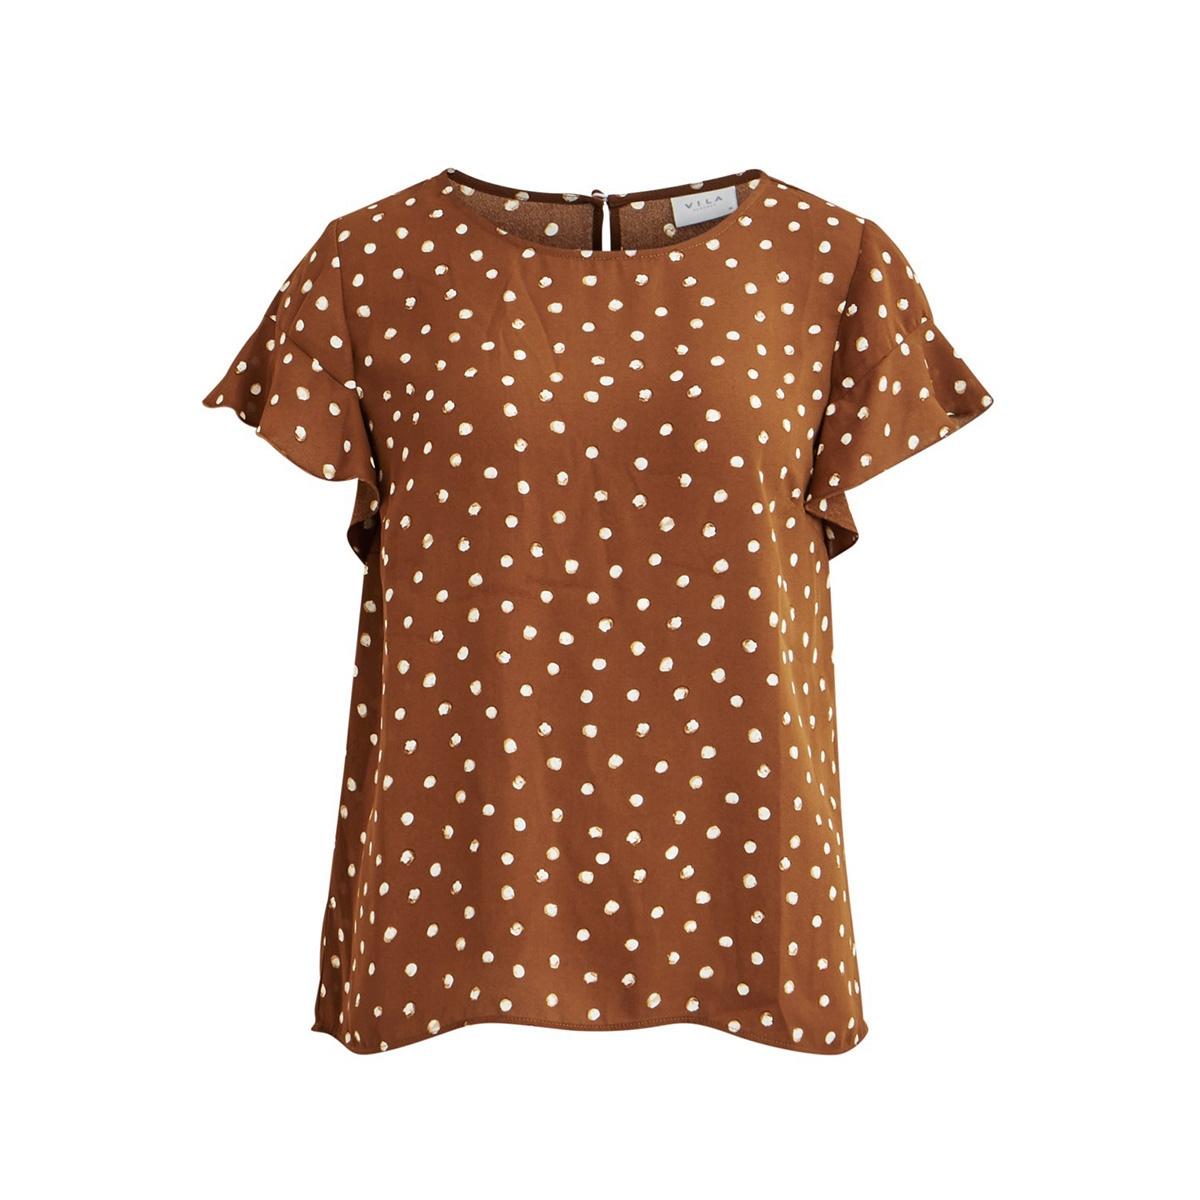 vilucy s/s flounce top - fav lux 14049944 vila t-shirt toffee/cloud dancer